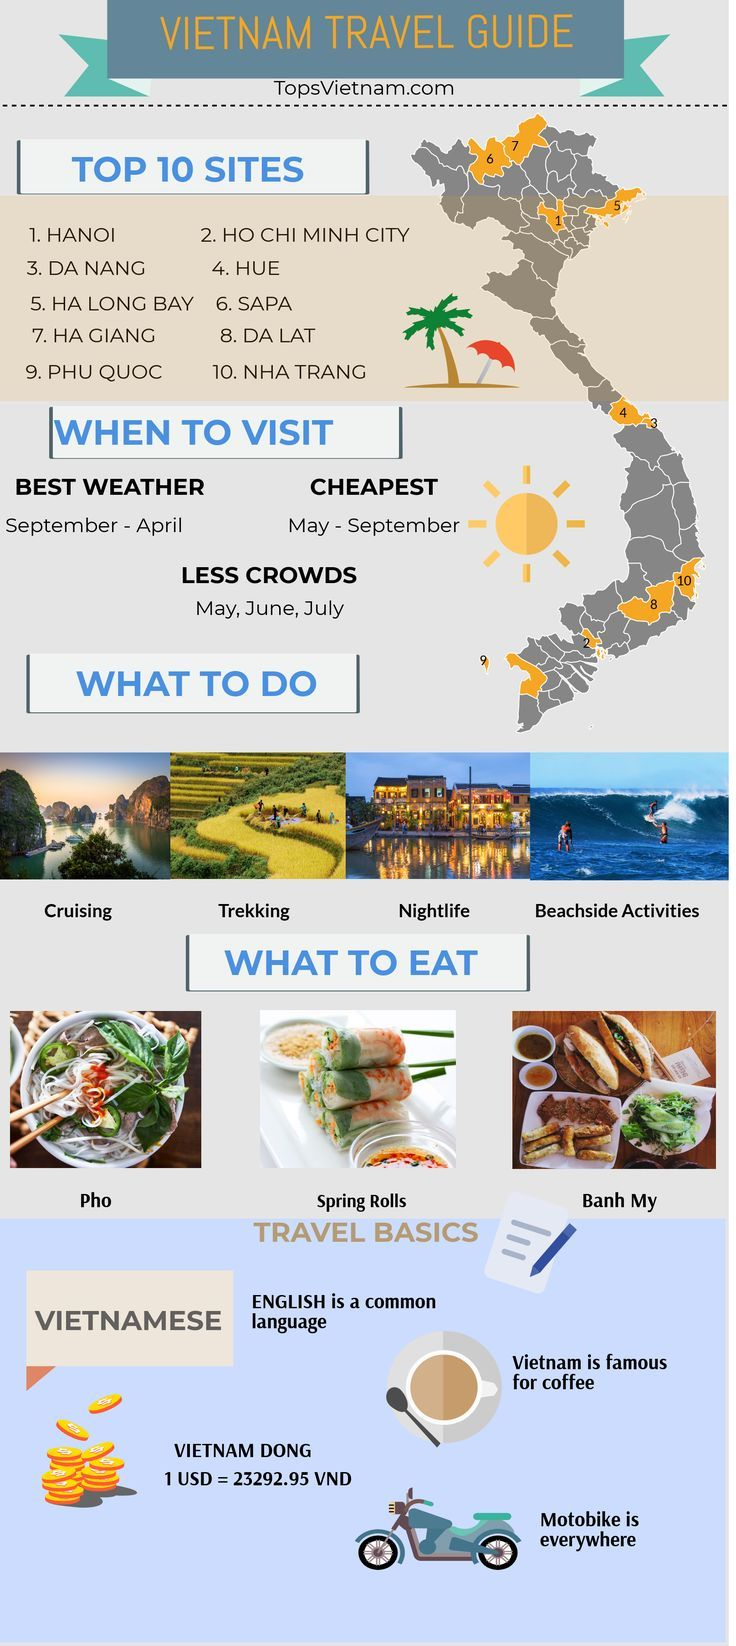 10 Best Things To Do In Vietnam Ultimate Guide 2020 Vietnam